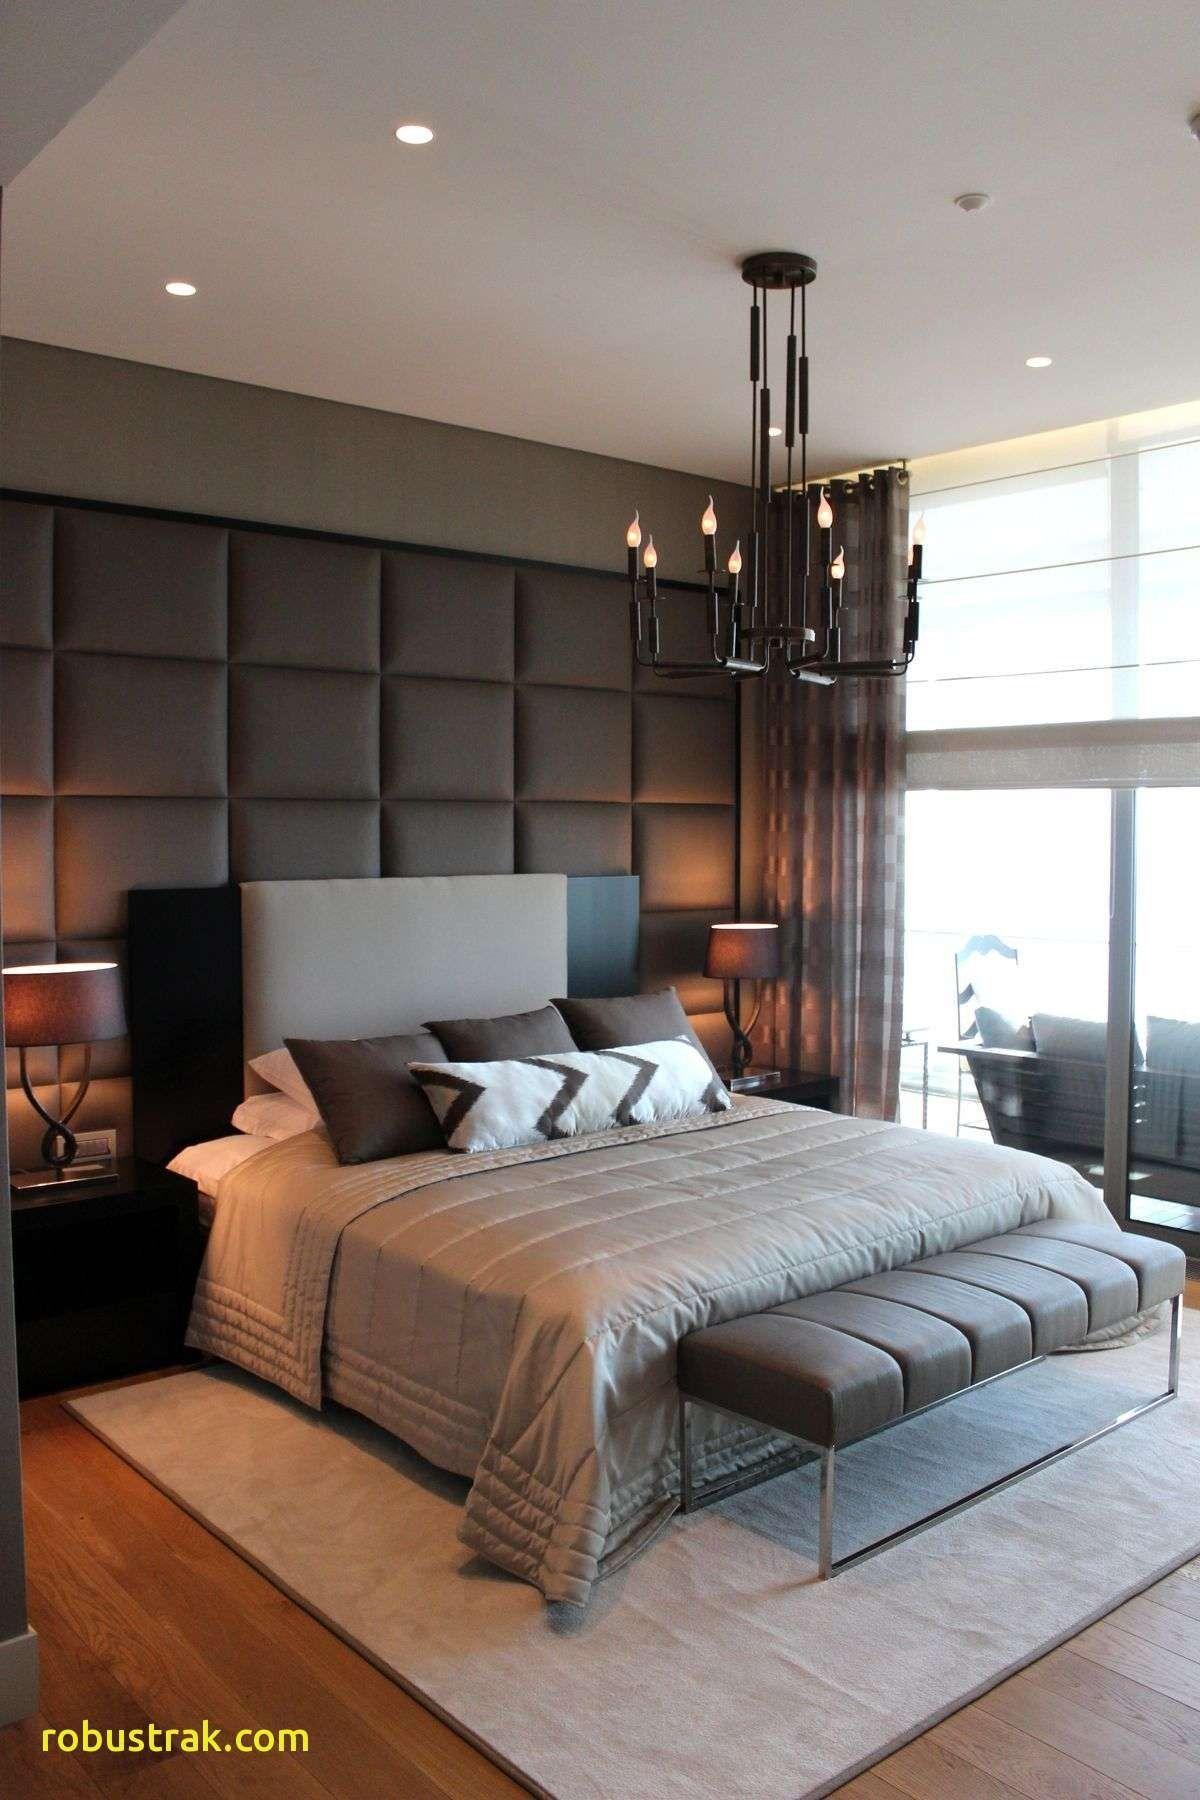 Latest Bedroom Ideas - June, 10  Luxurious bedrooms, Remodel